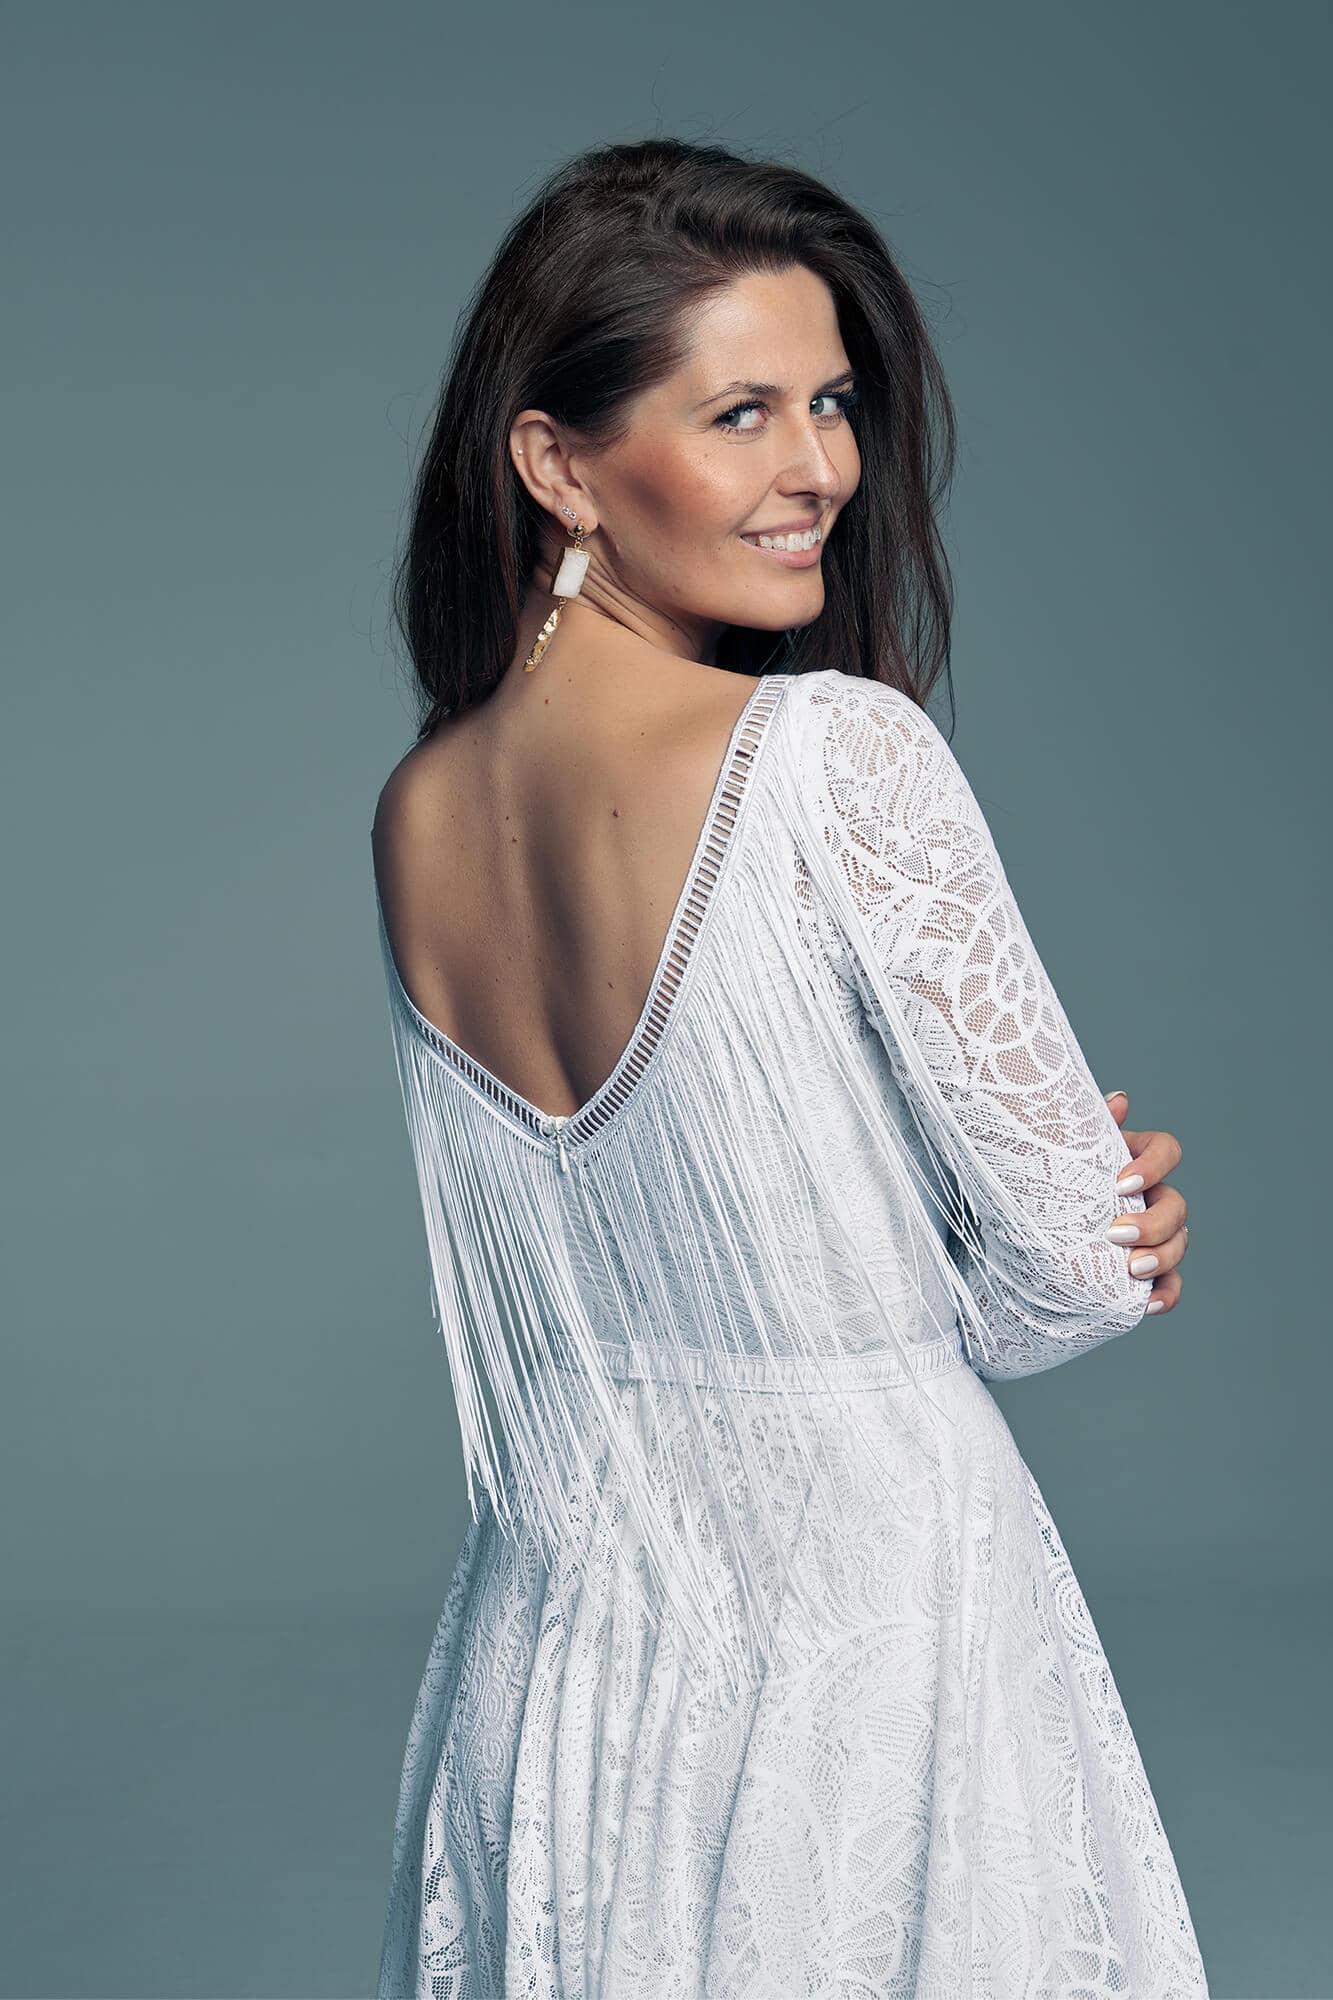 Wedding dress combination of classics and fringes from Boho style Santorini 8